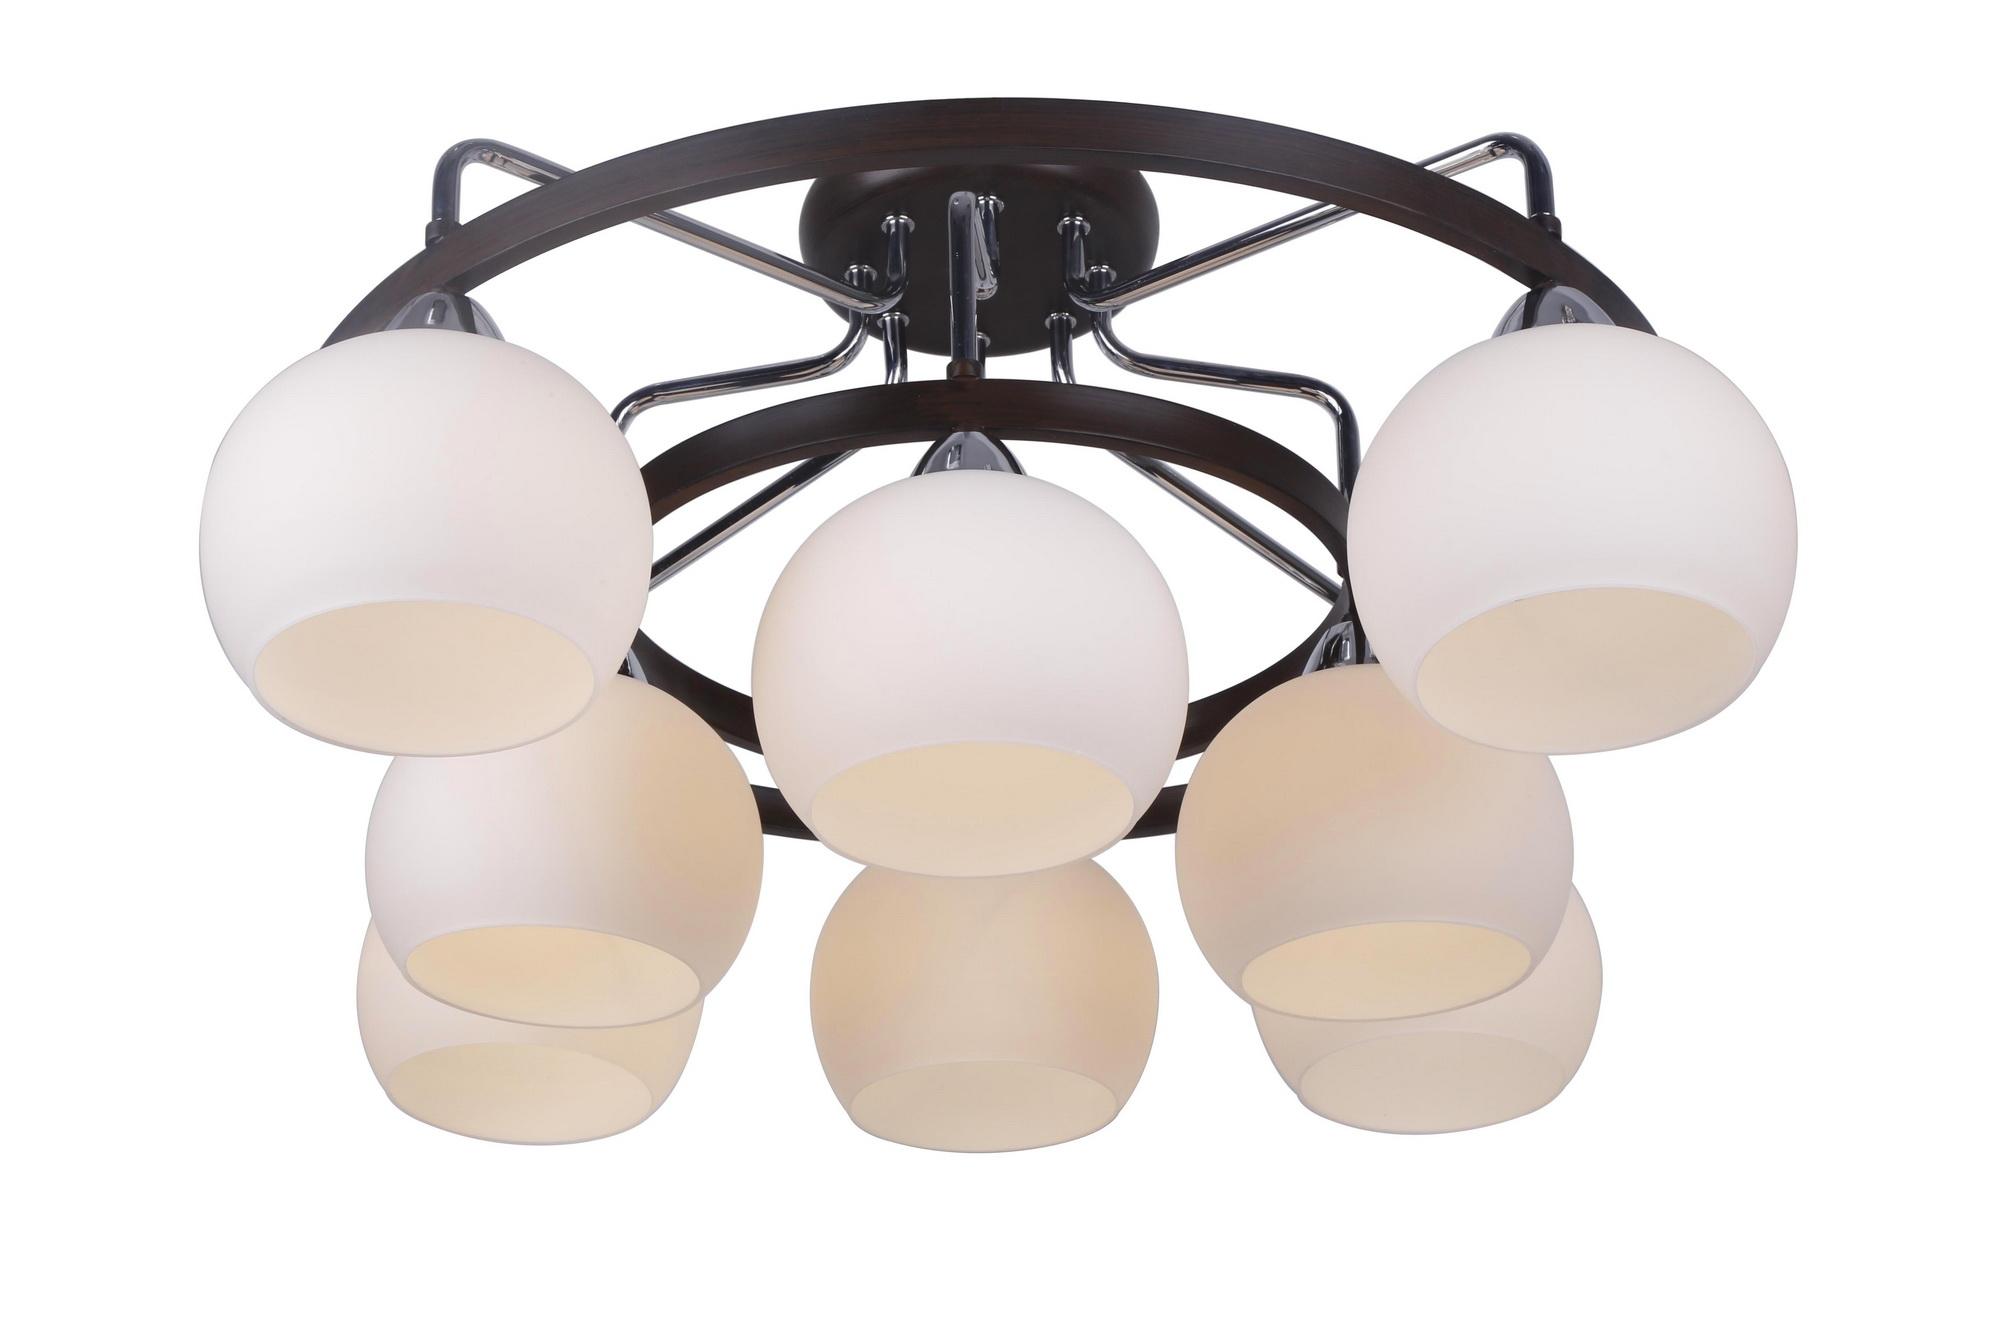 Люстра Arte lamp Empoli a7148pl-8ck